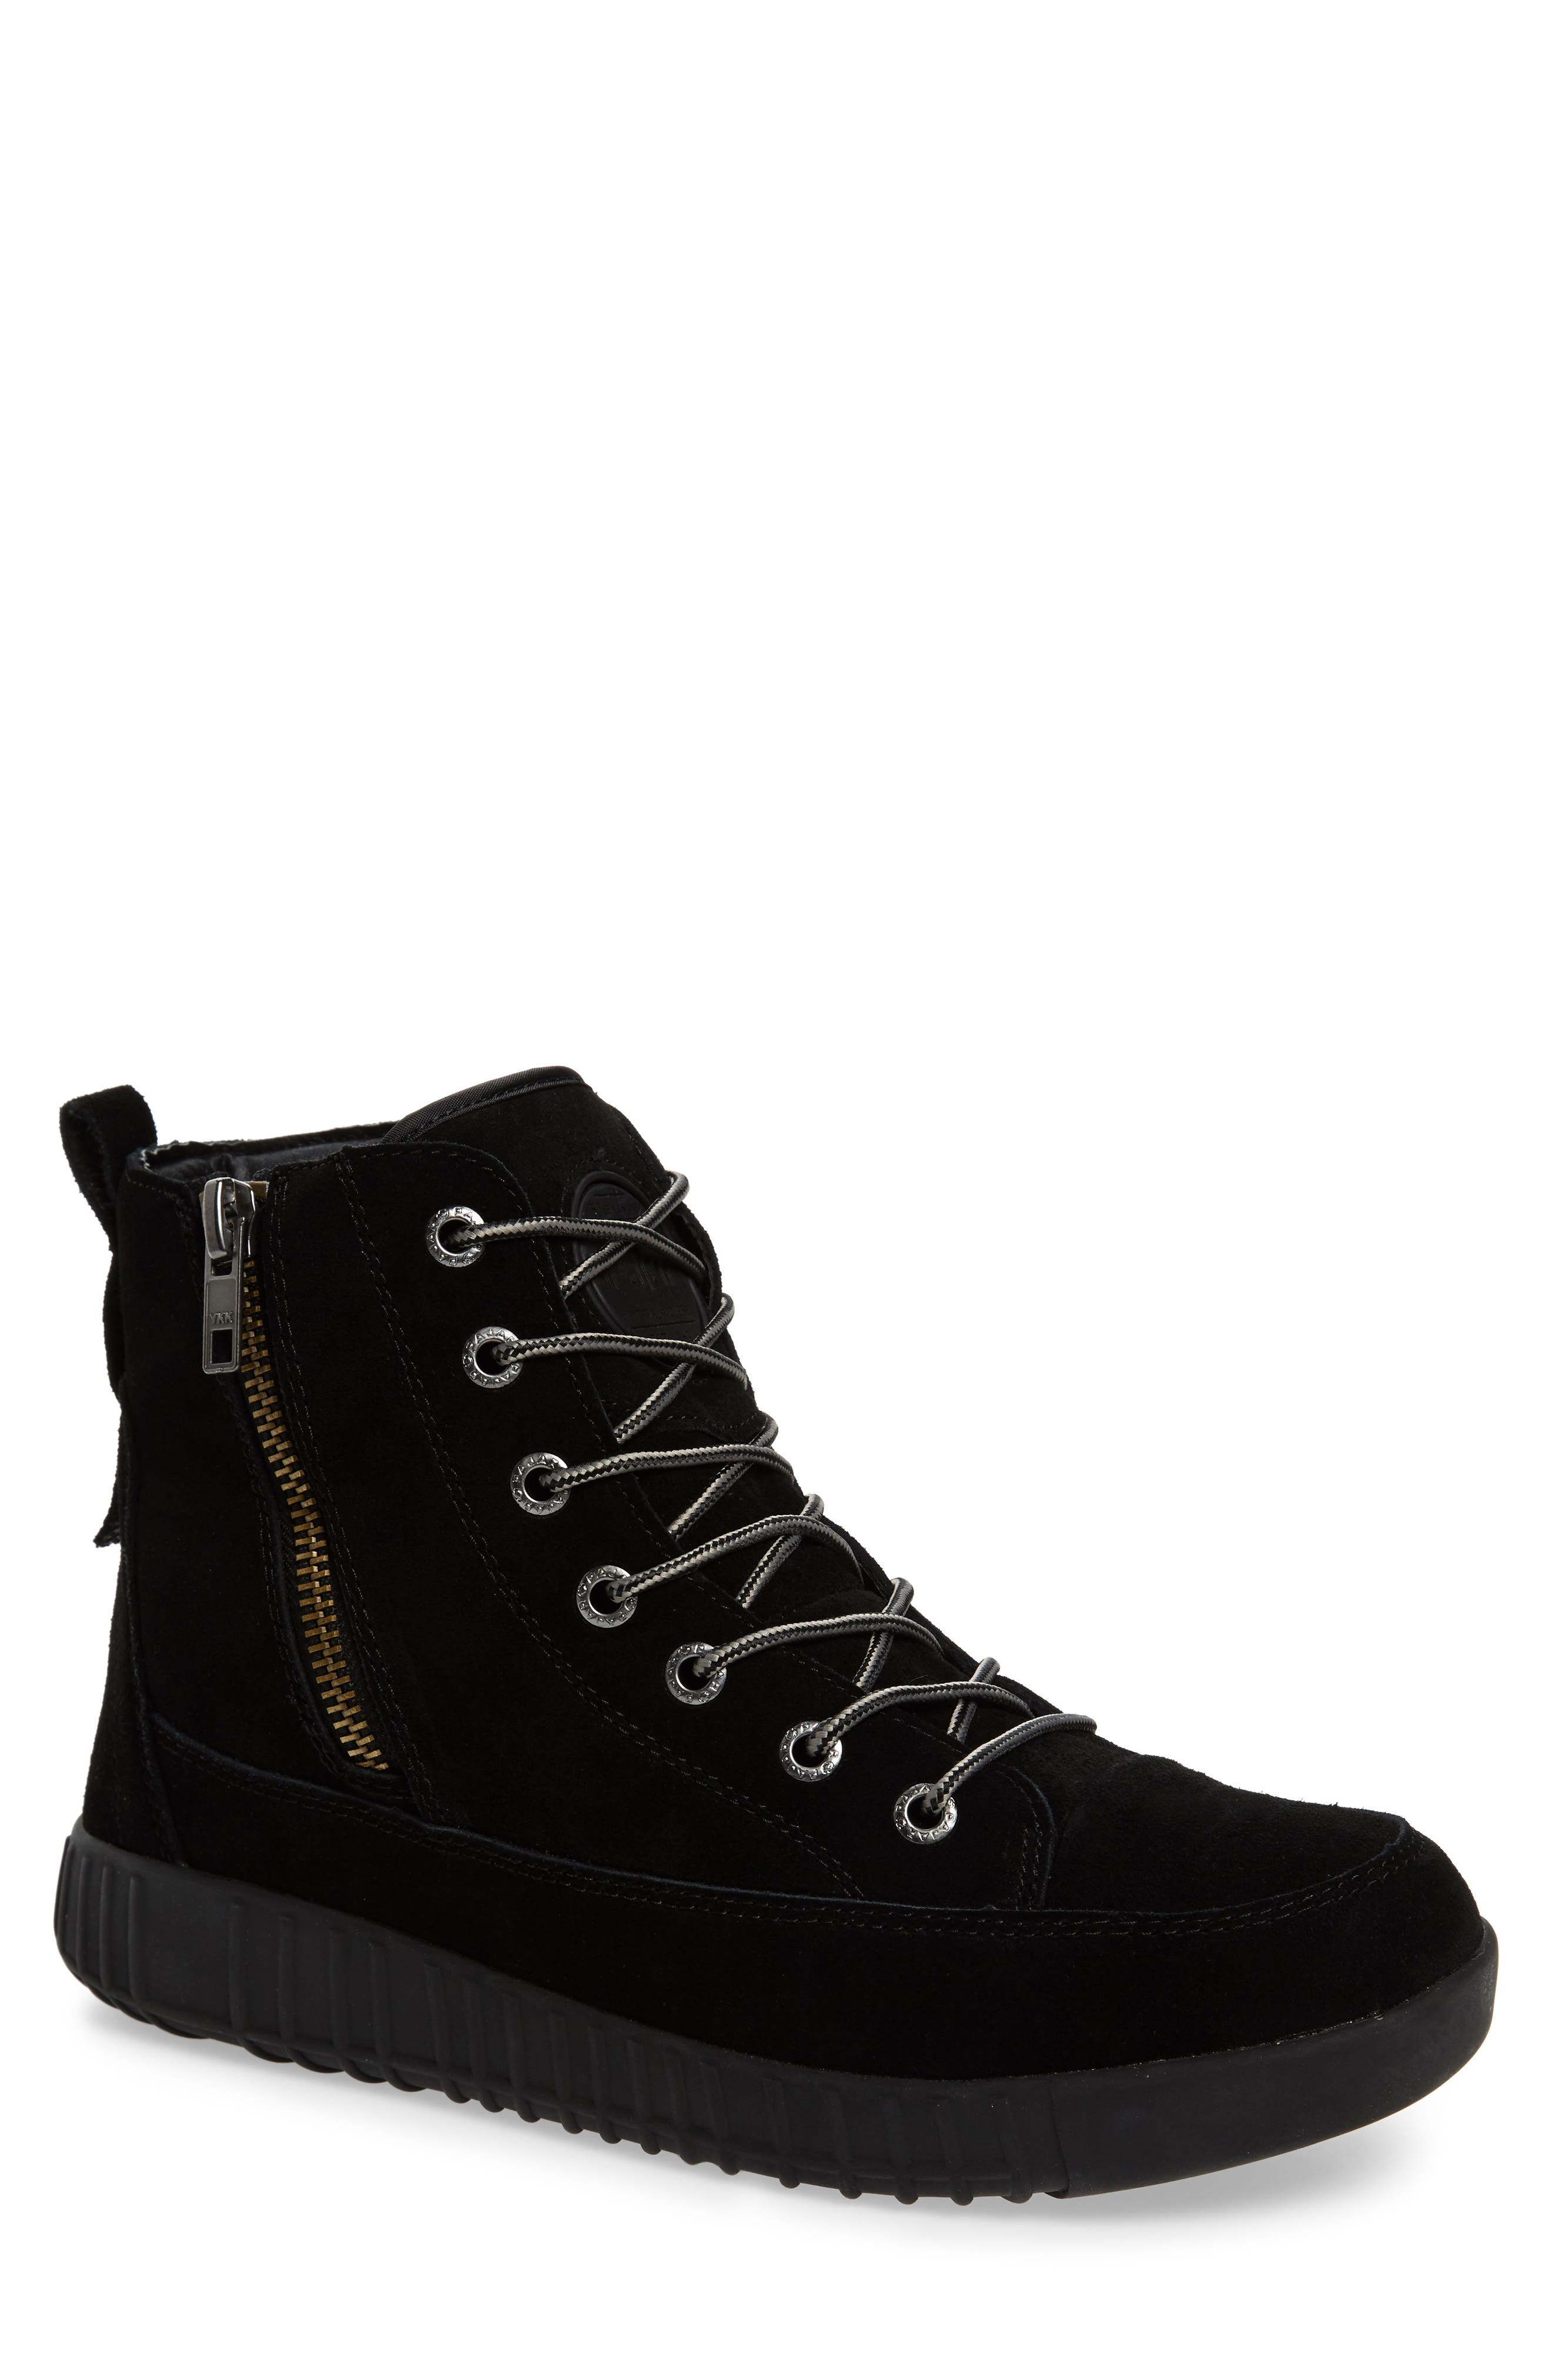 PAJAR,                             Parnell Waterproof Winter Sneaker,                             Main thumbnail 1, color,                             001